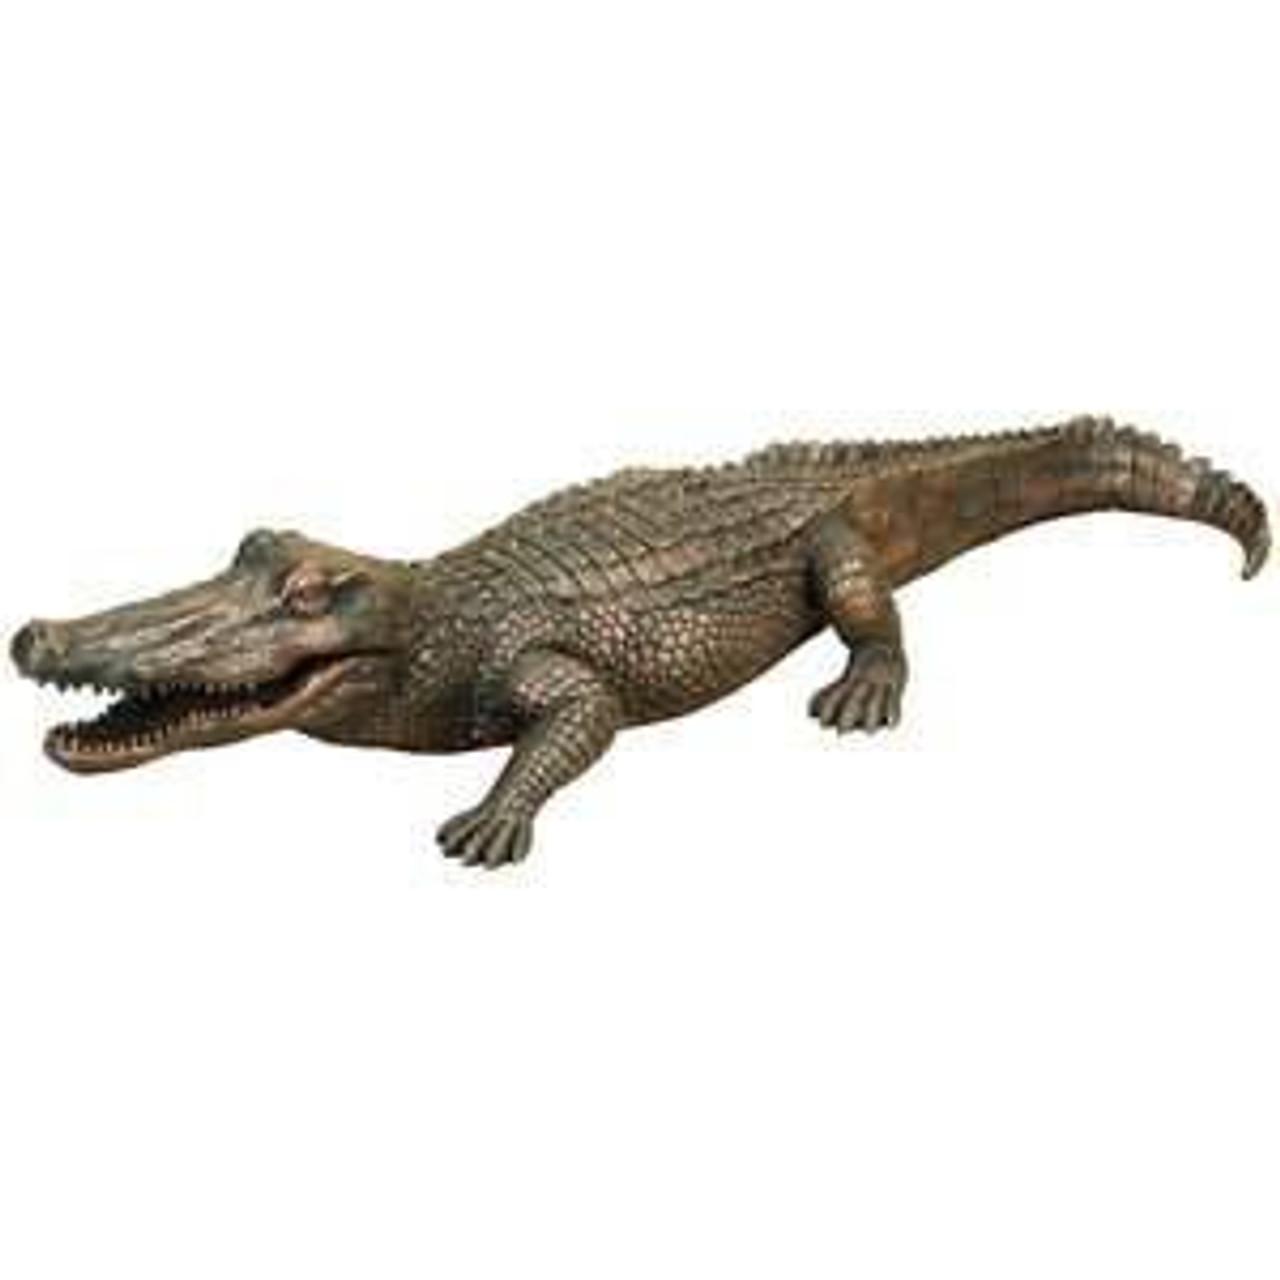 Alligator Statues